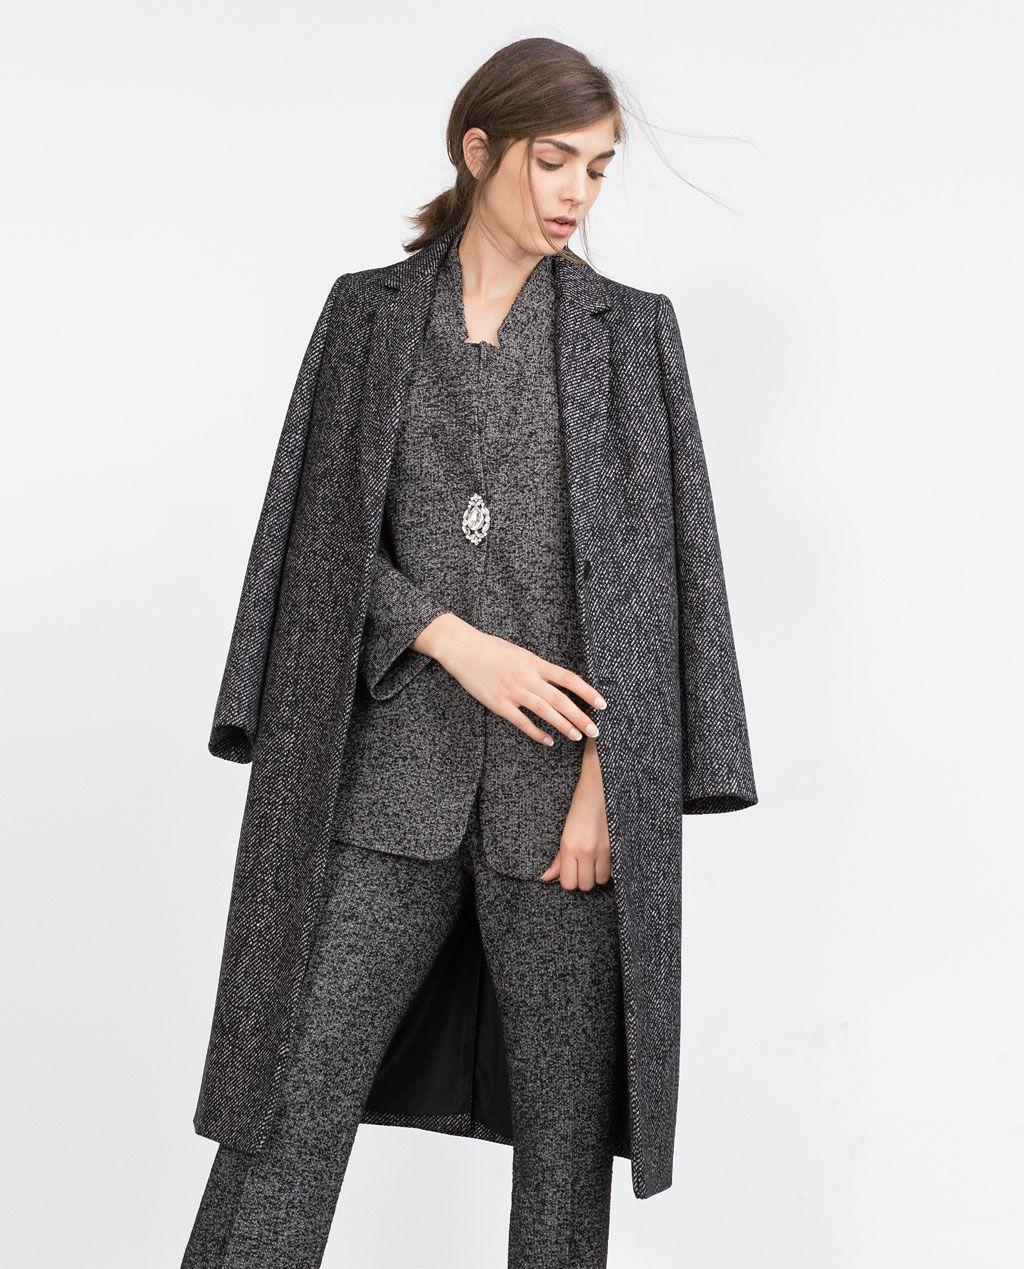 c5a64f79 HANDMADE LONG COAT-Coats-Outerwear-WOMAN | ZARA United States | I ...